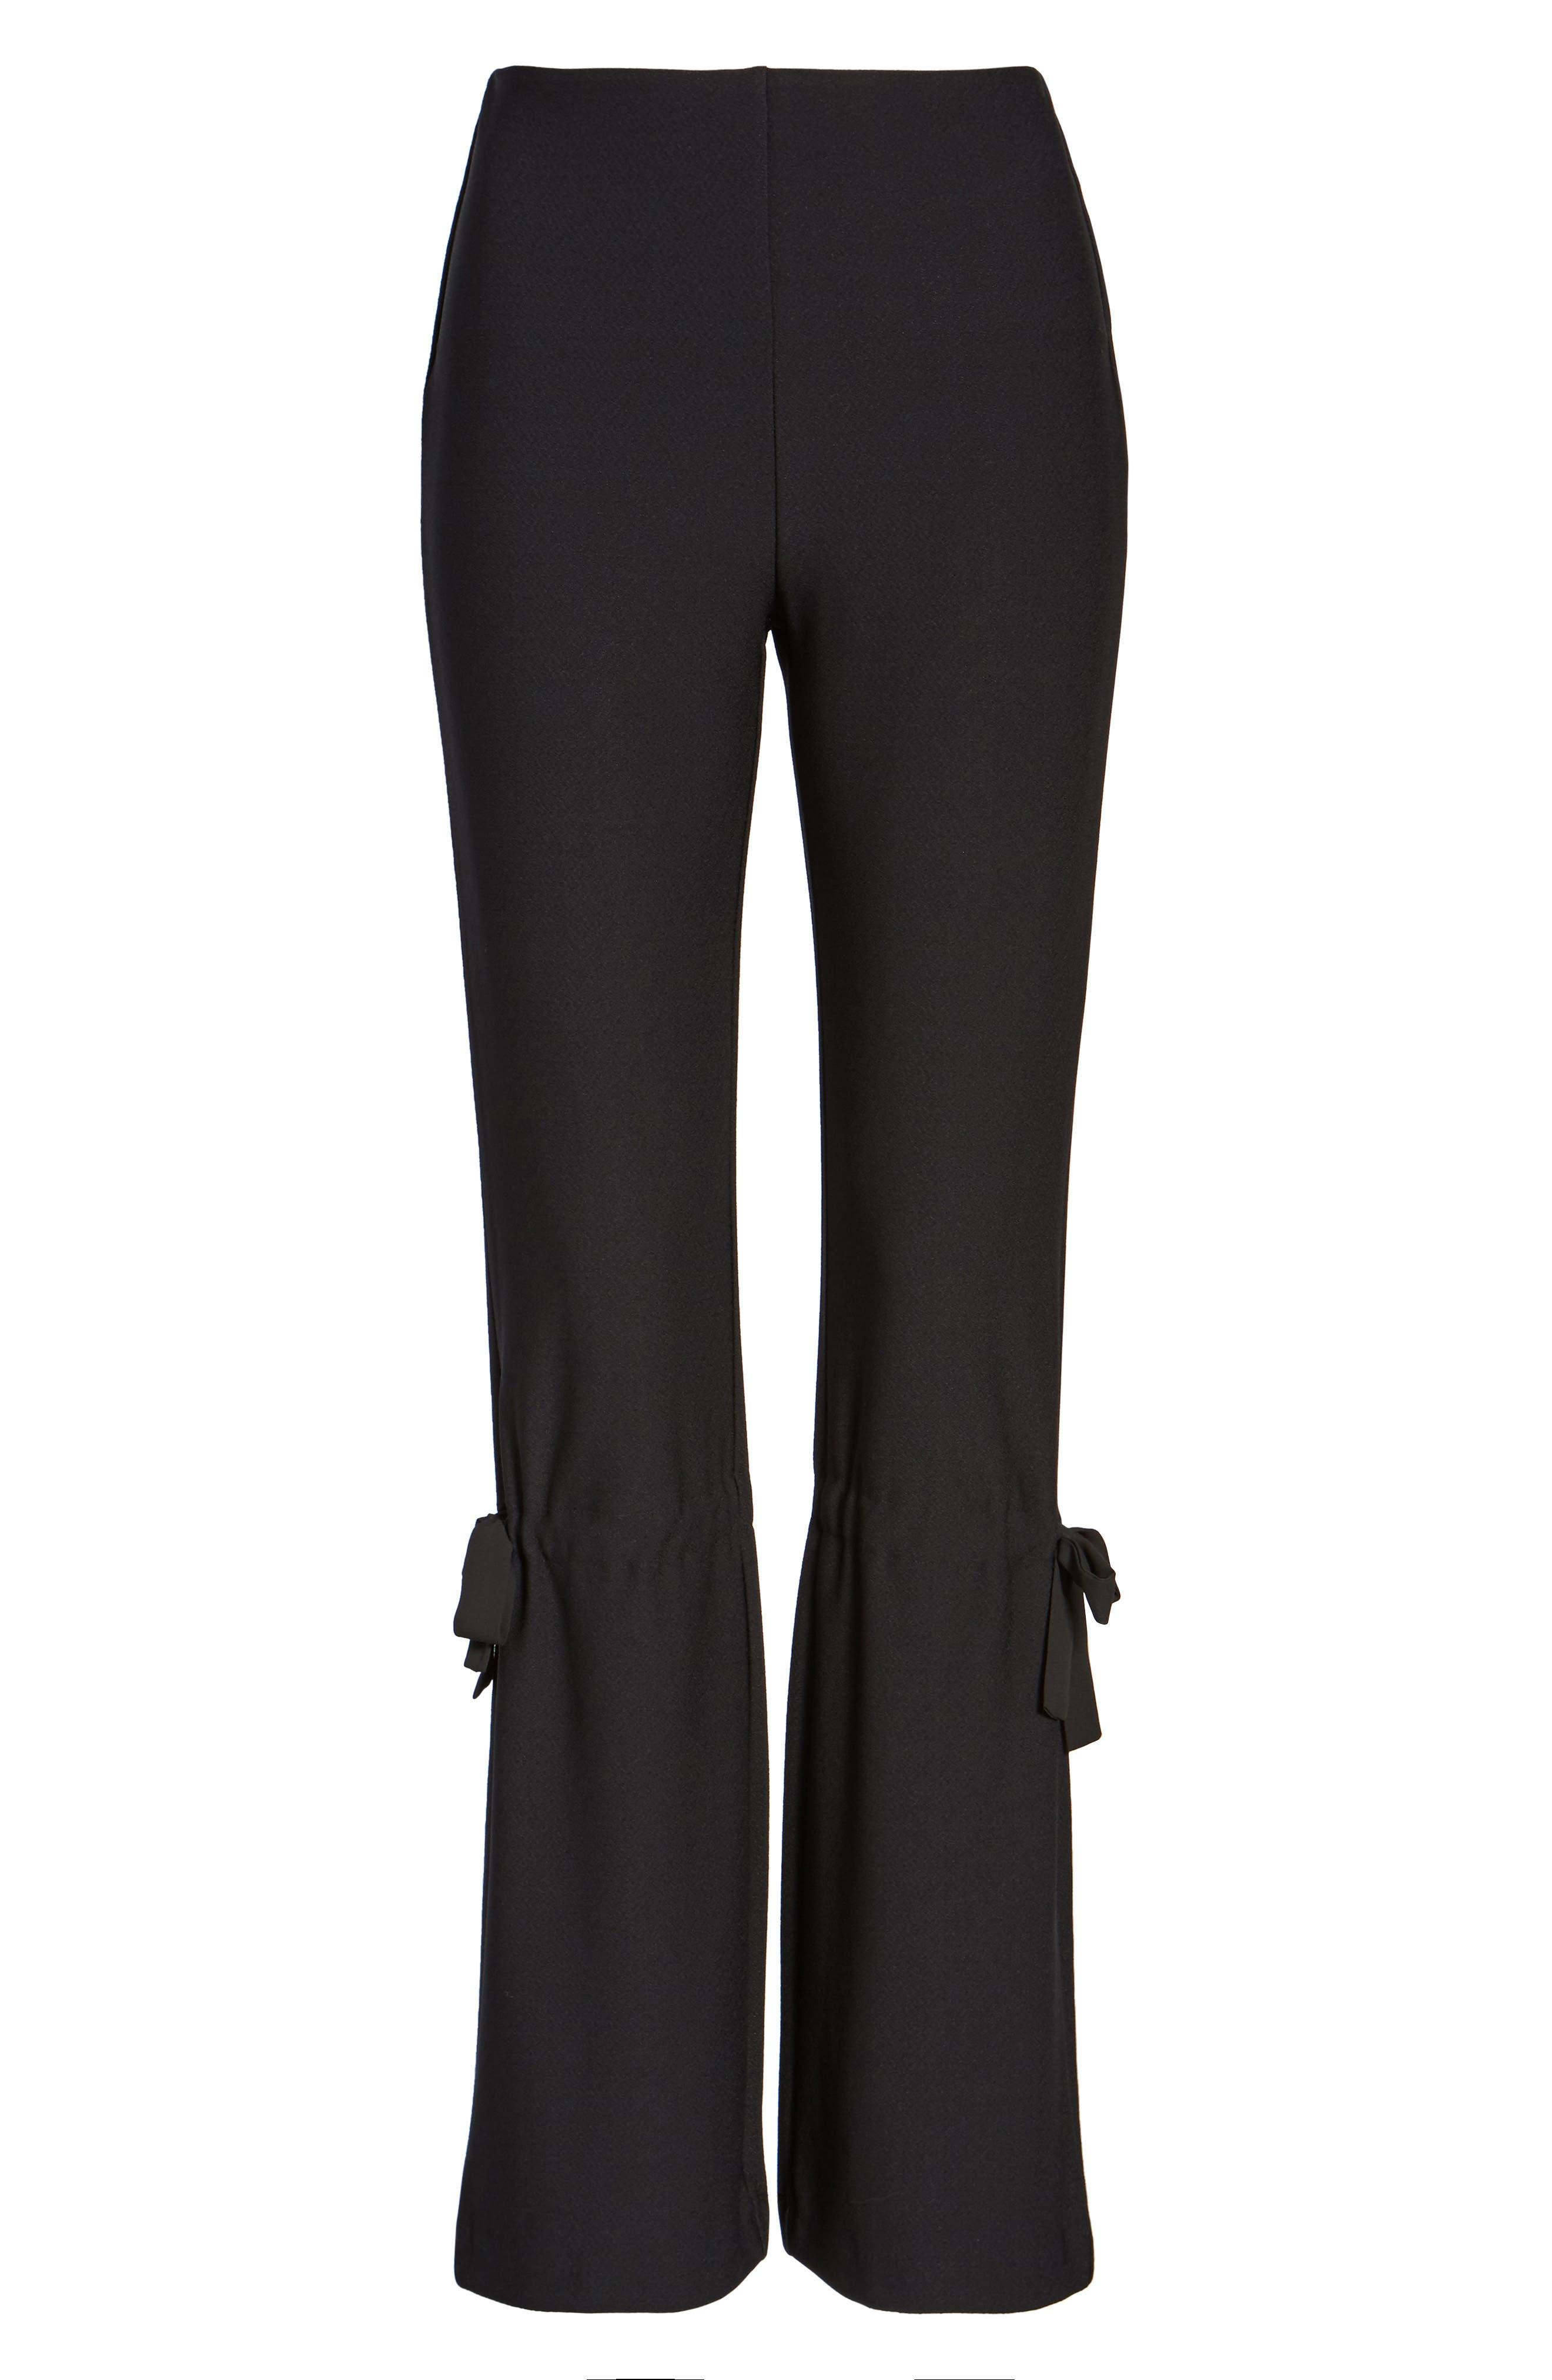 Arcadia High Waist Pants,                             Alternate thumbnail 4, color,                             Black